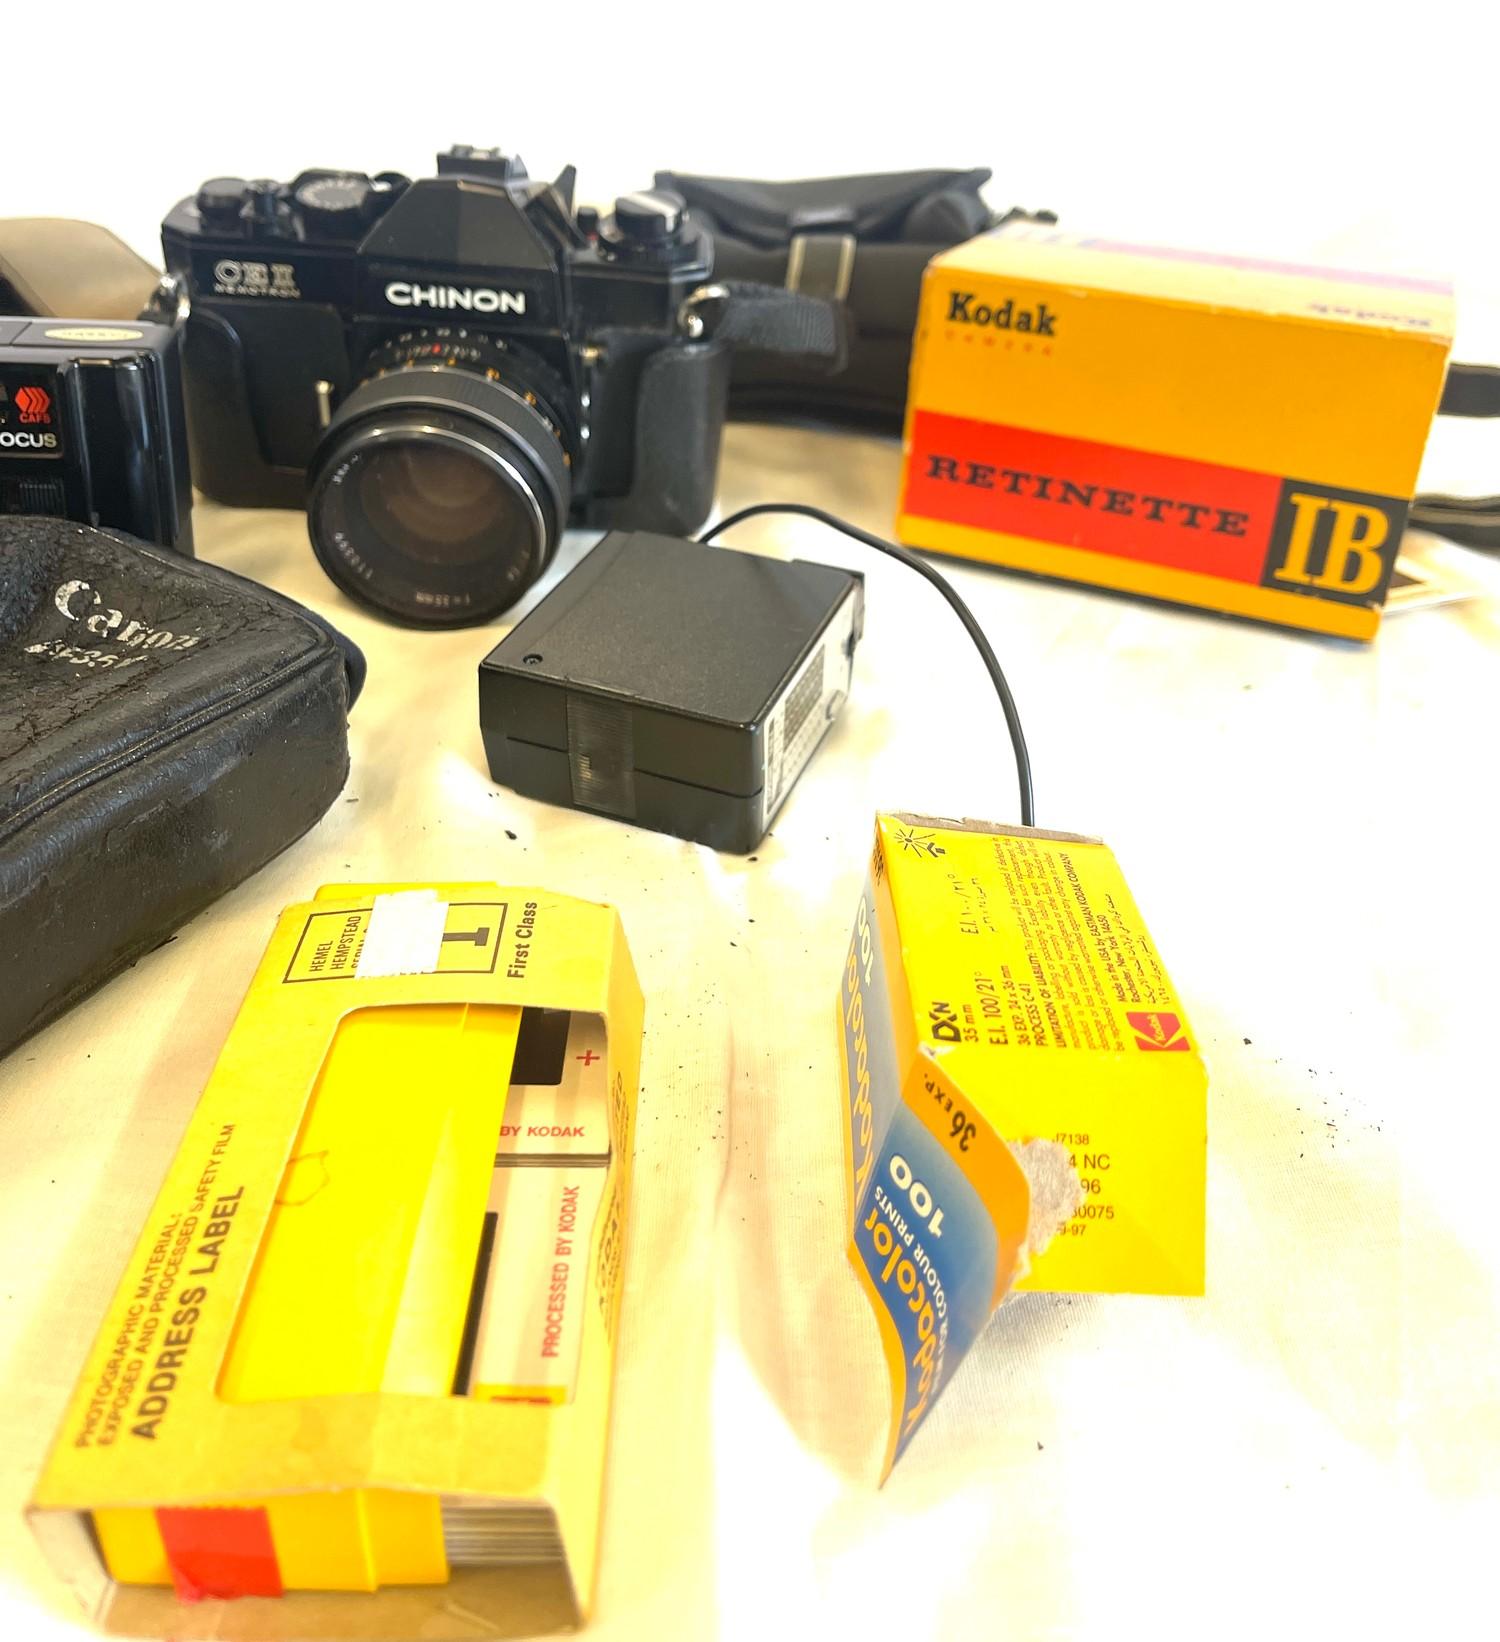 Selection of cameras to include Canon AF35m, Kodak Retinette 1b, Chinon CEII memotron camera, - Image 4 of 4